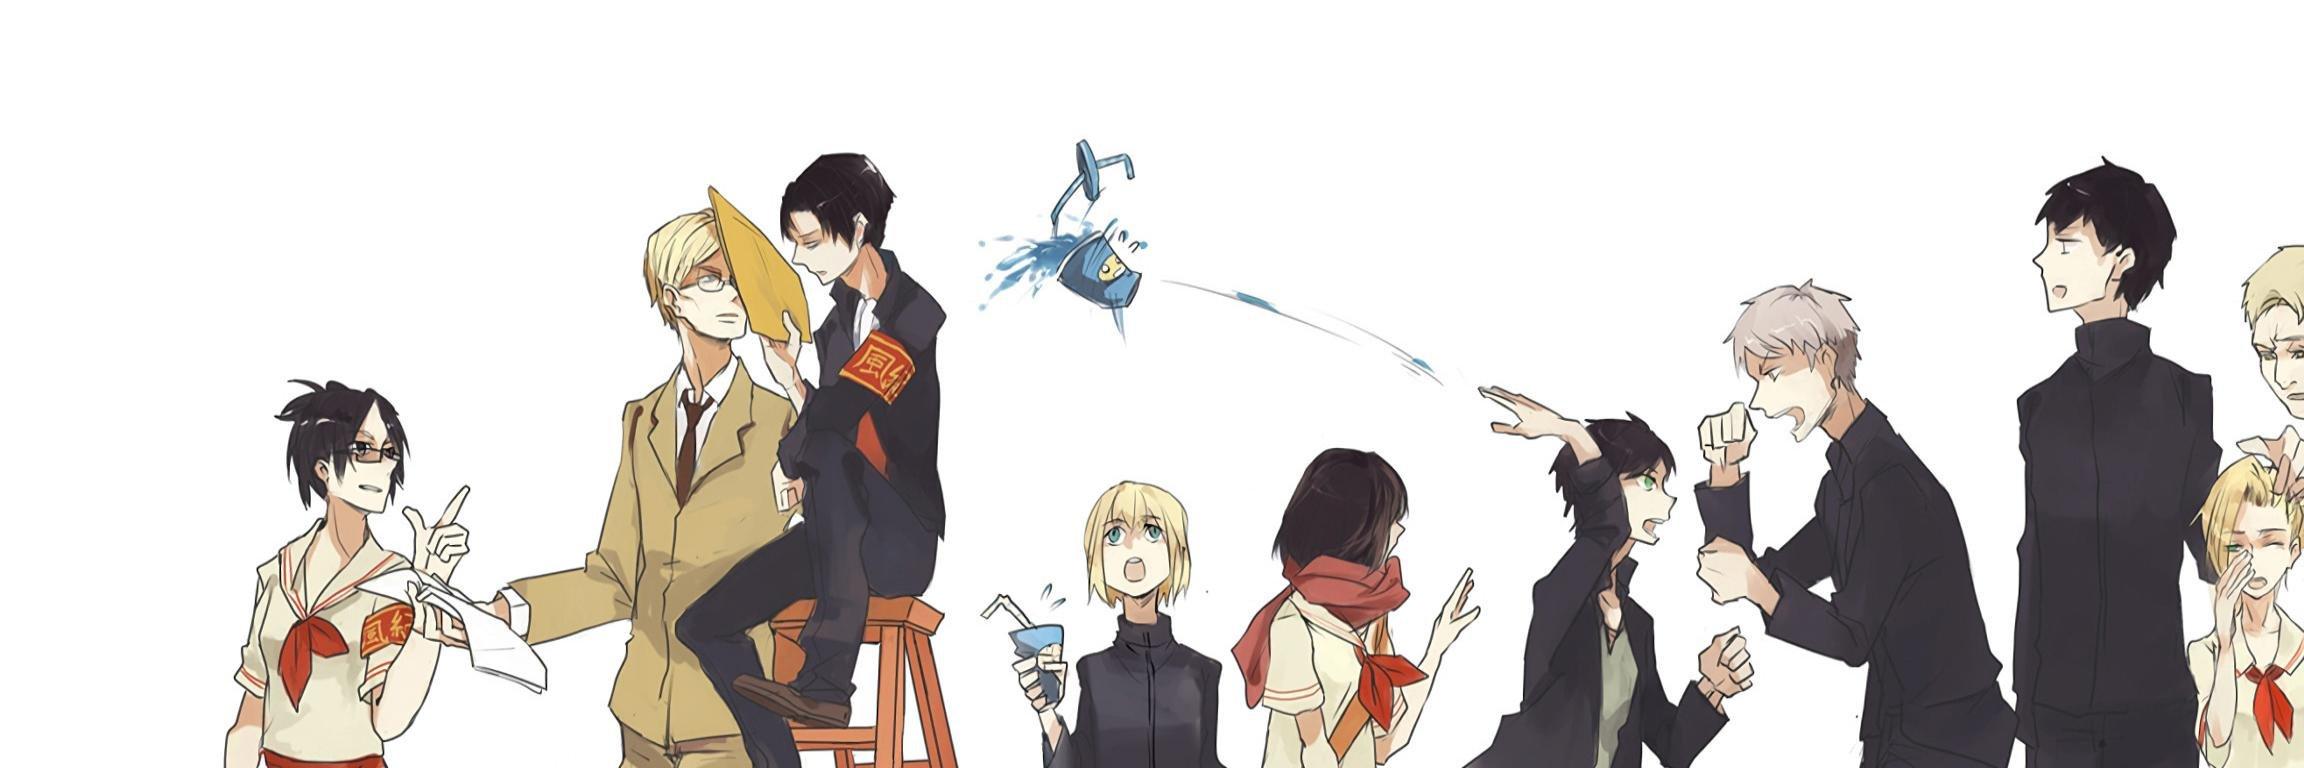 Zendha 2 Monitor Wallpaper Anime